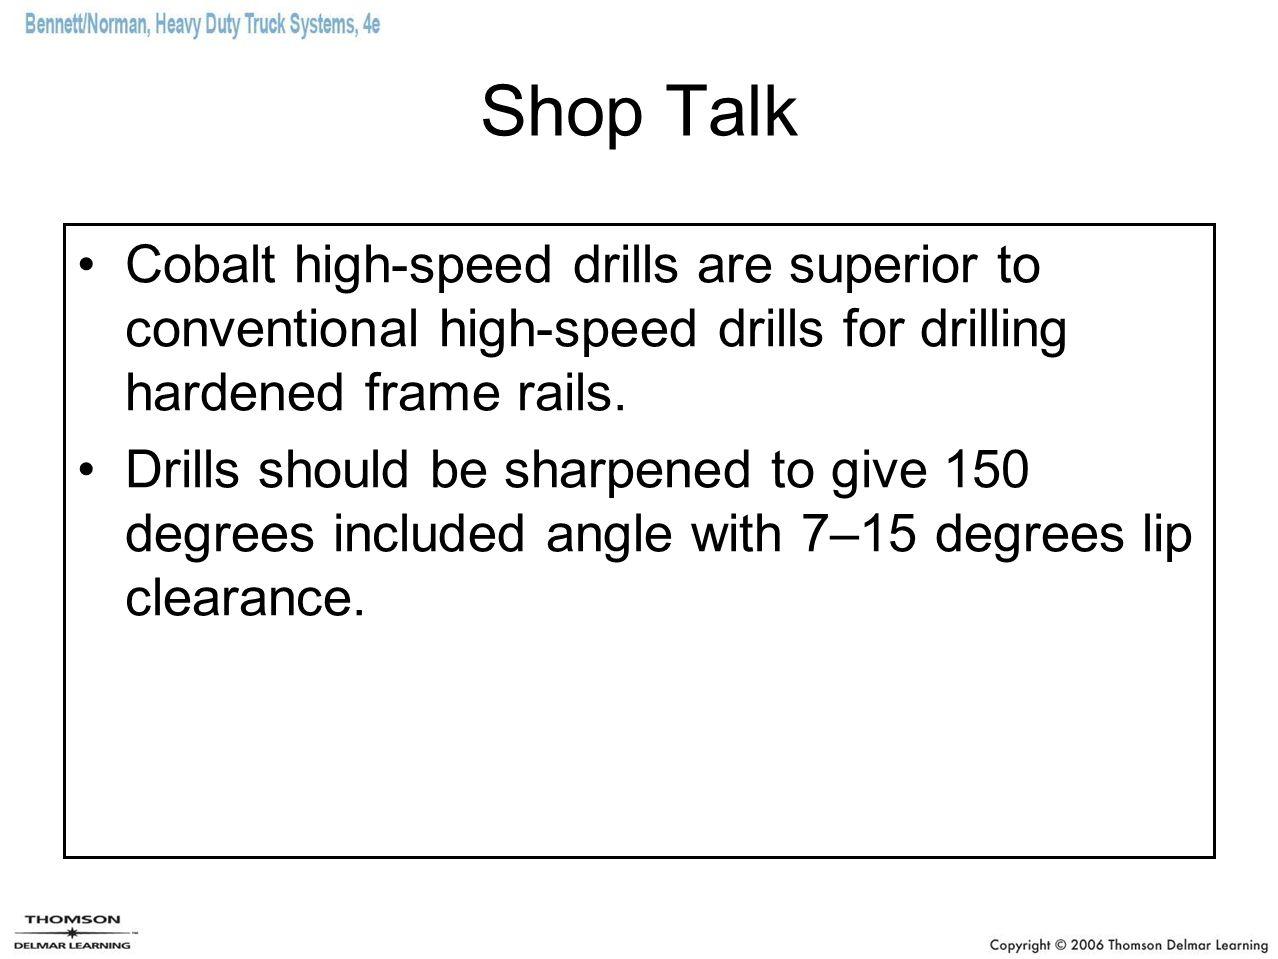 Shop Talk Cobalt high-speed drills are superior to conventional high-speed drills for drilling hardened frame rails. Drills should be sharpened to giv